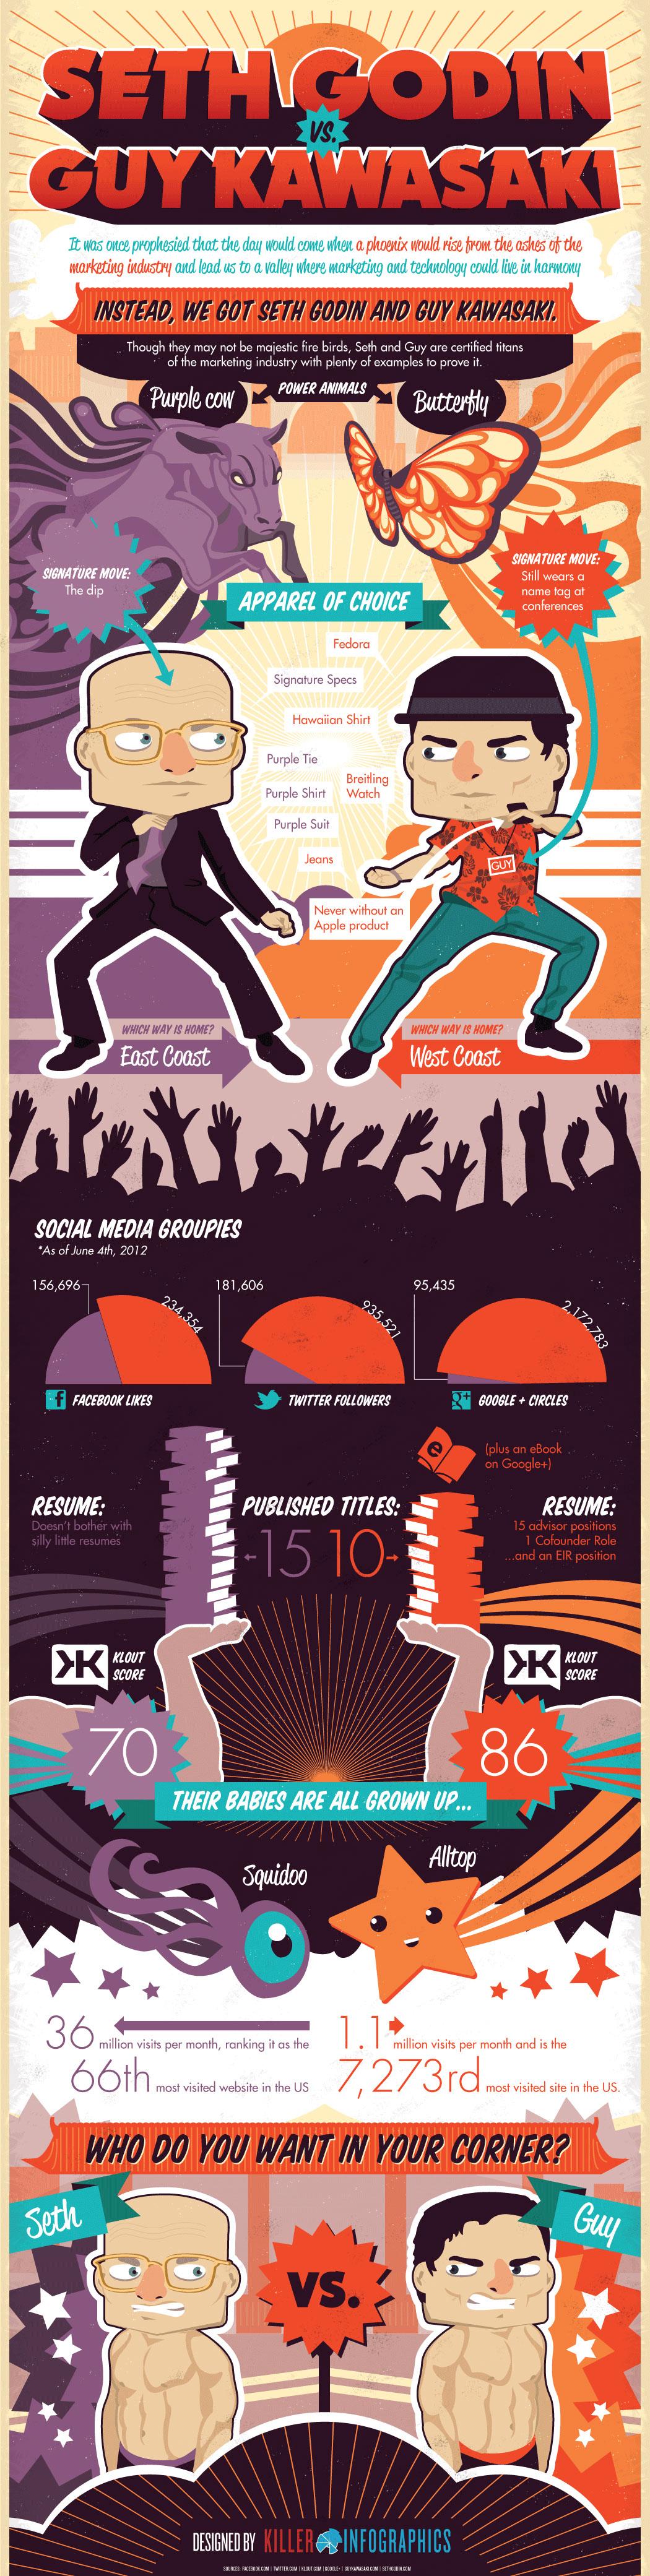 Sethgodin-Vs-Guykawasaki-infographic